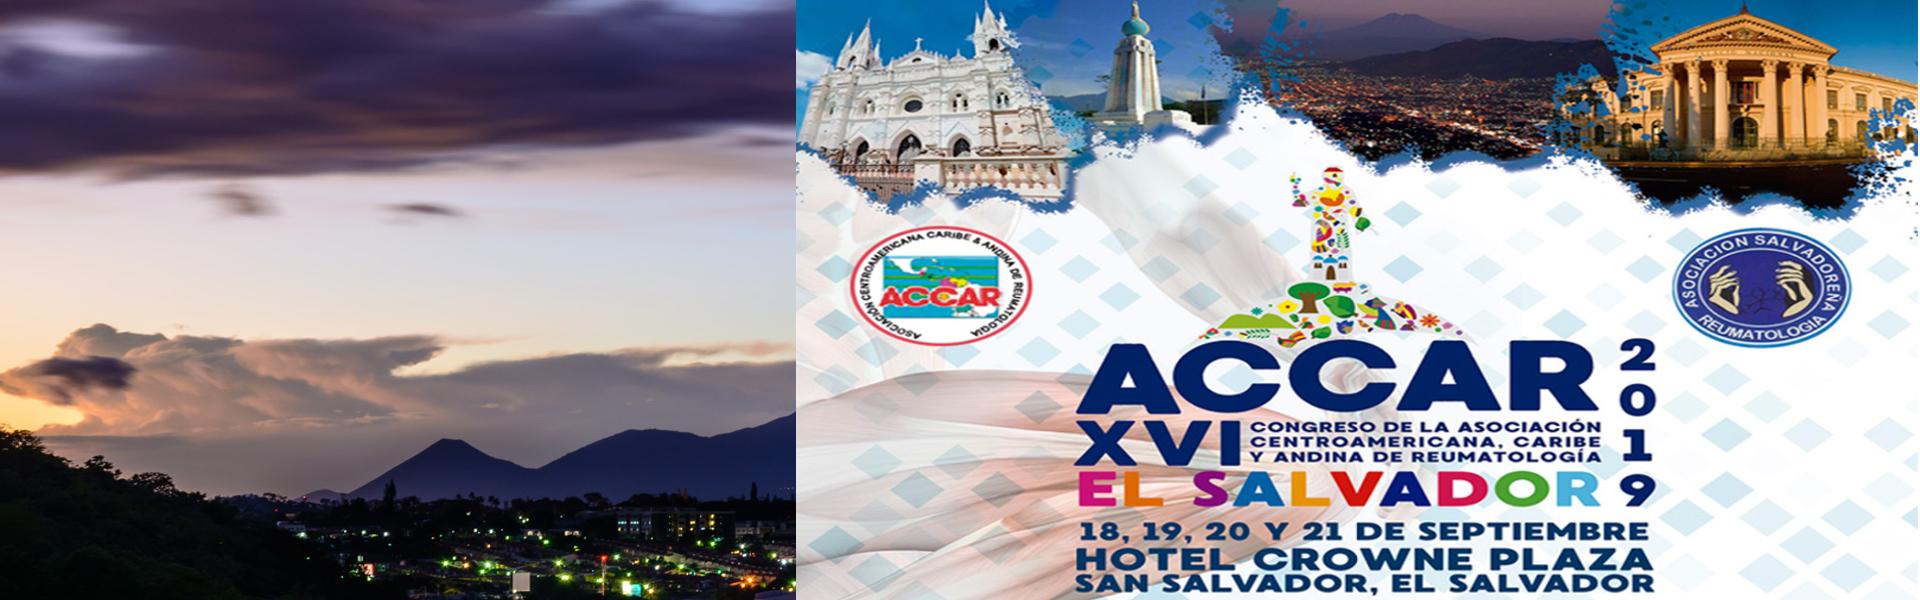 Participa del ACCAR 2019